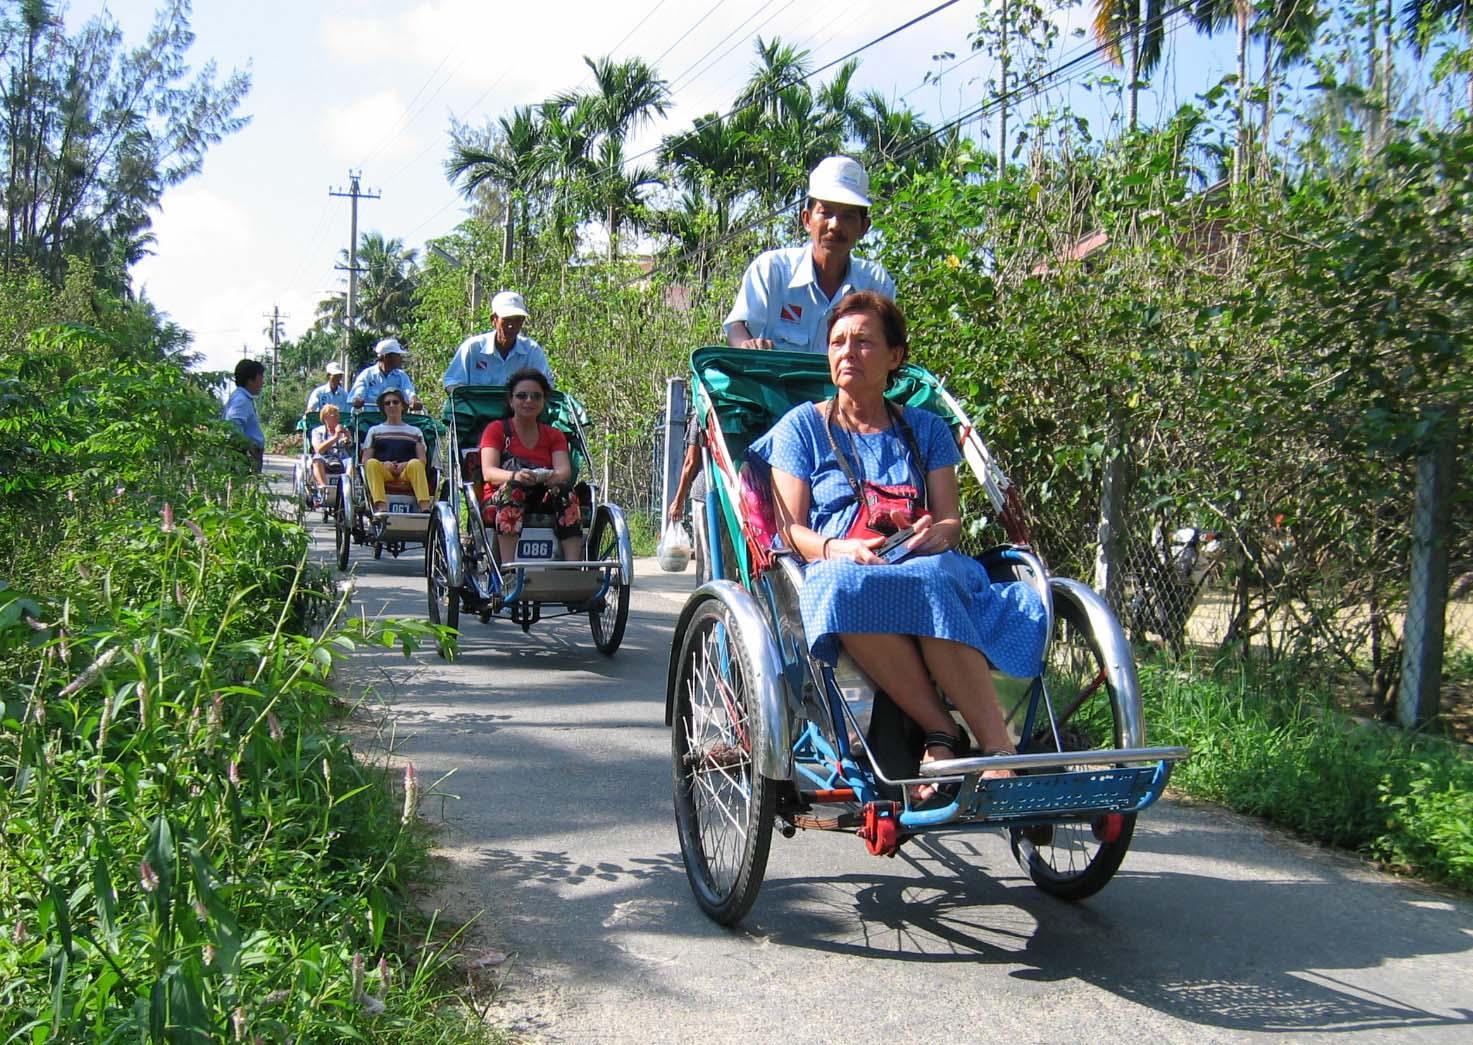 A modern homestay in central Vietnam